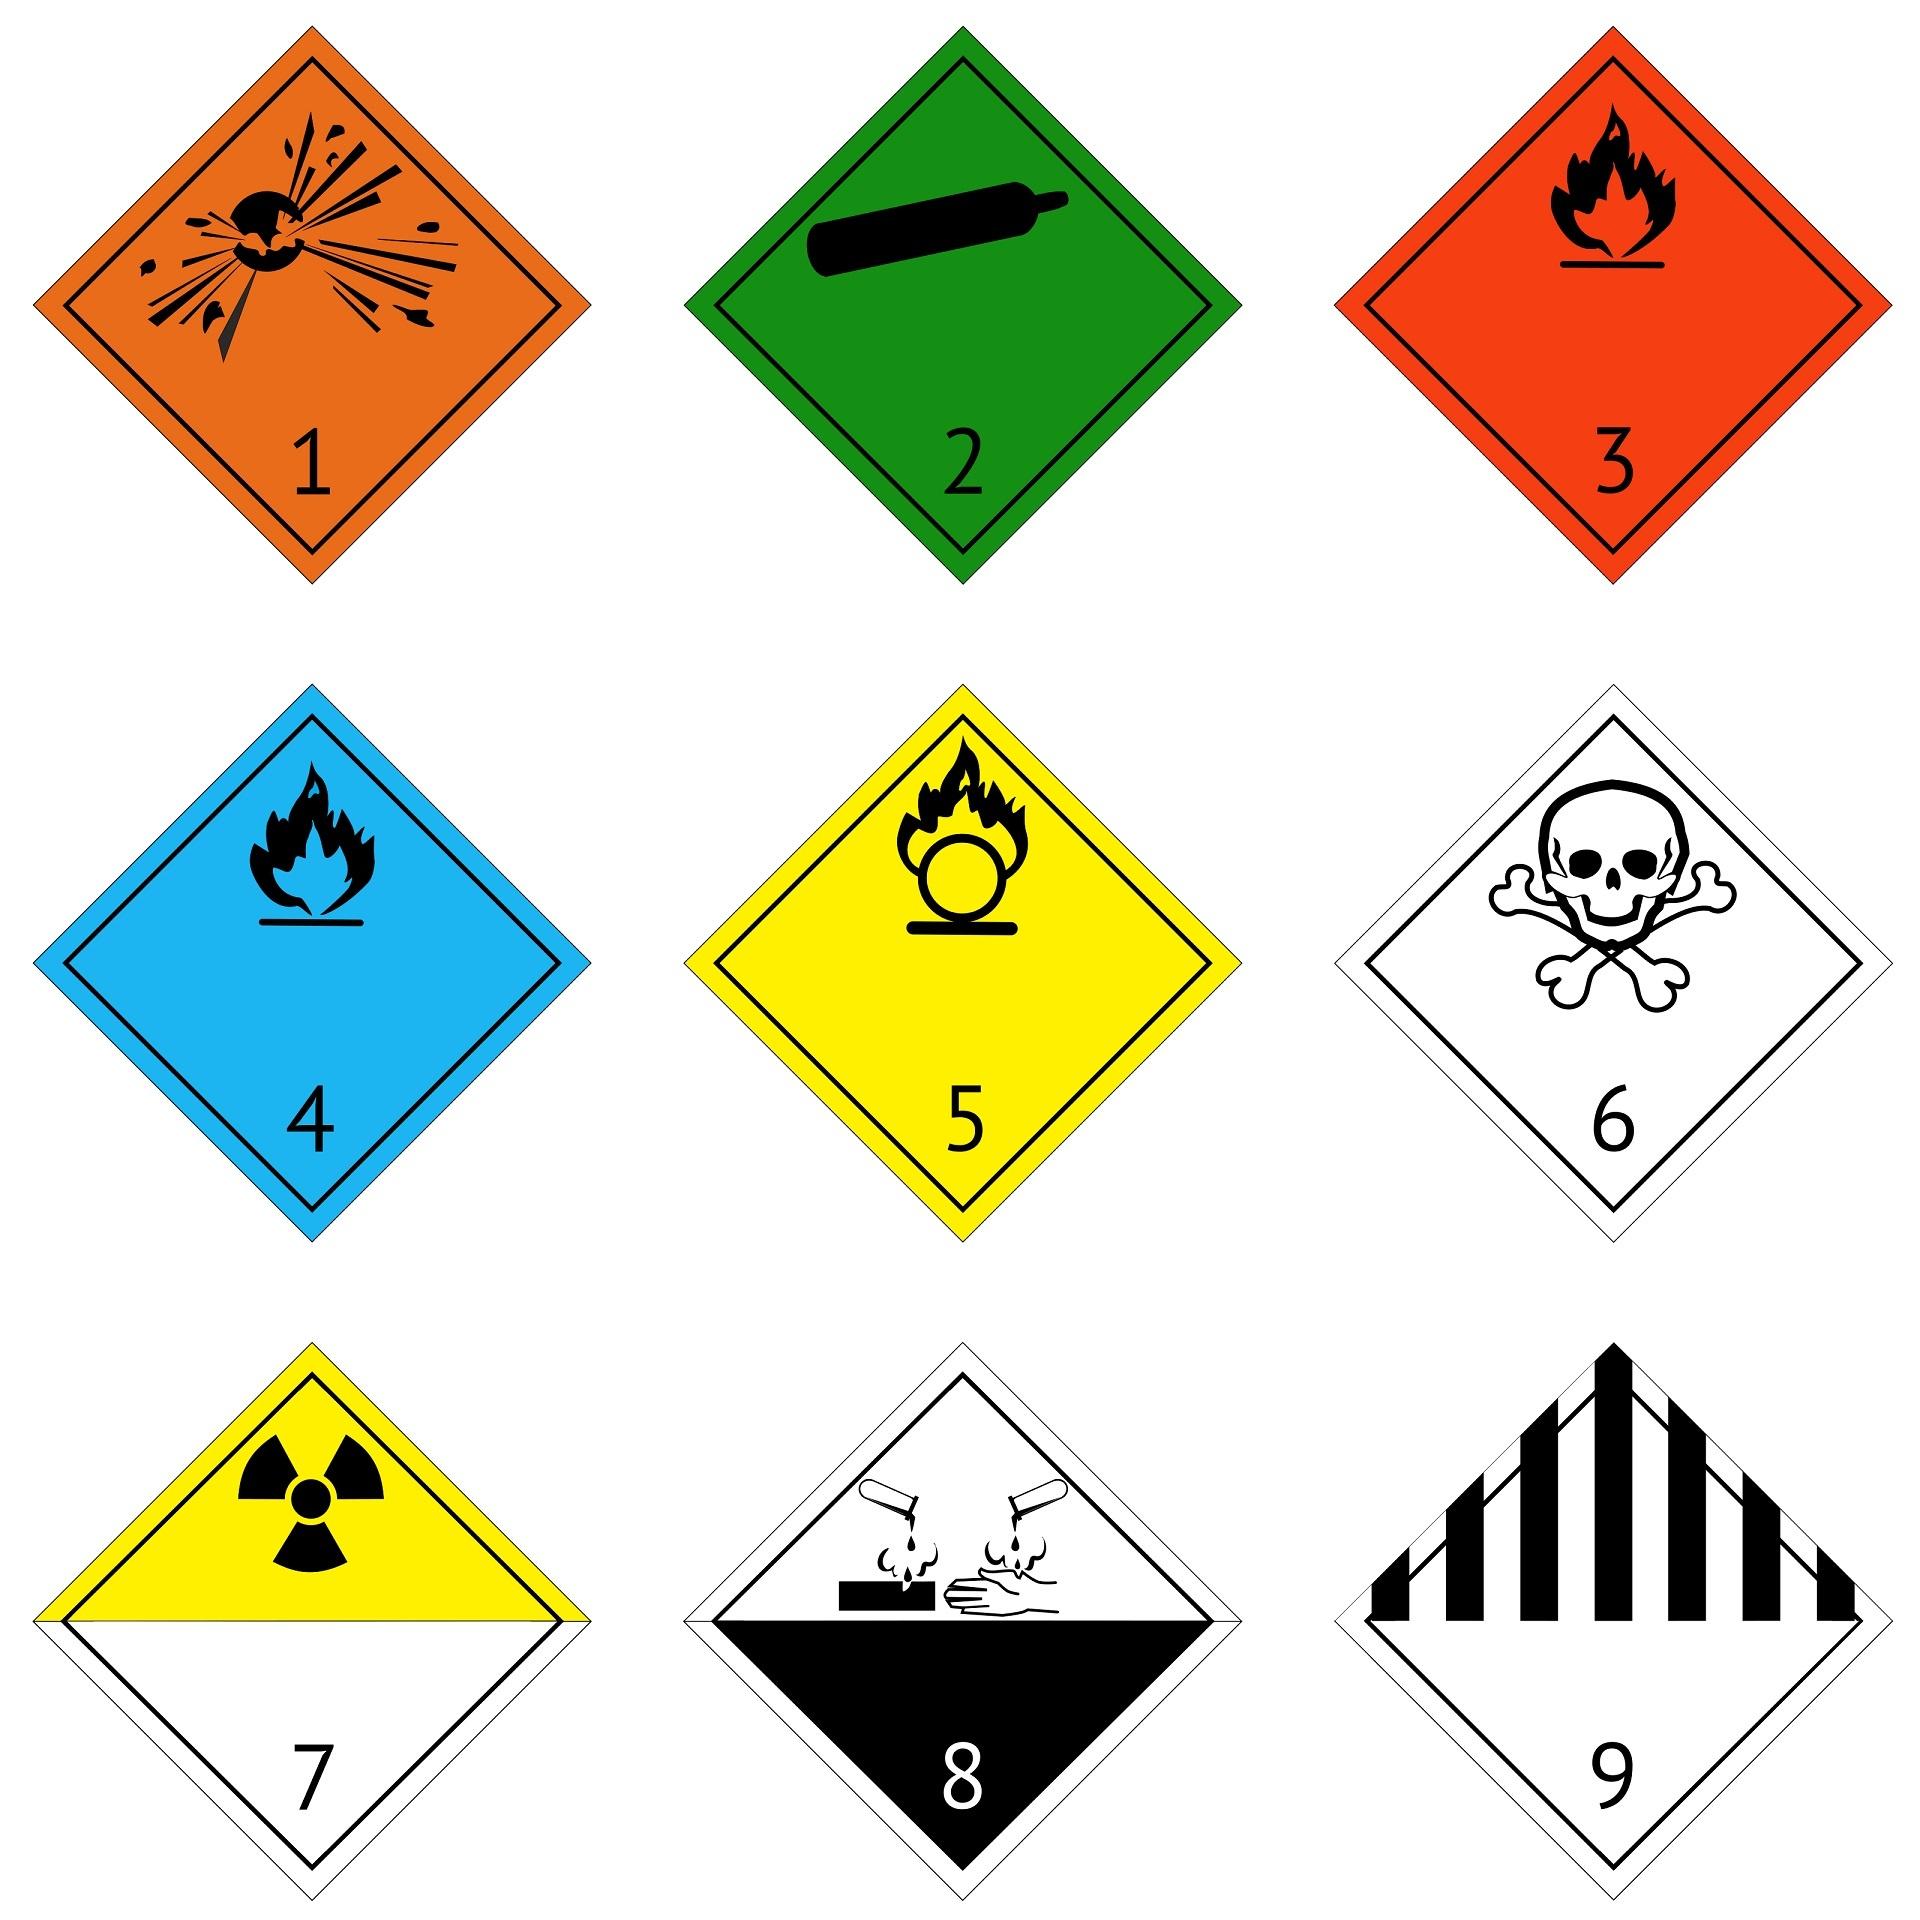 The 9 classes of dangerous goods